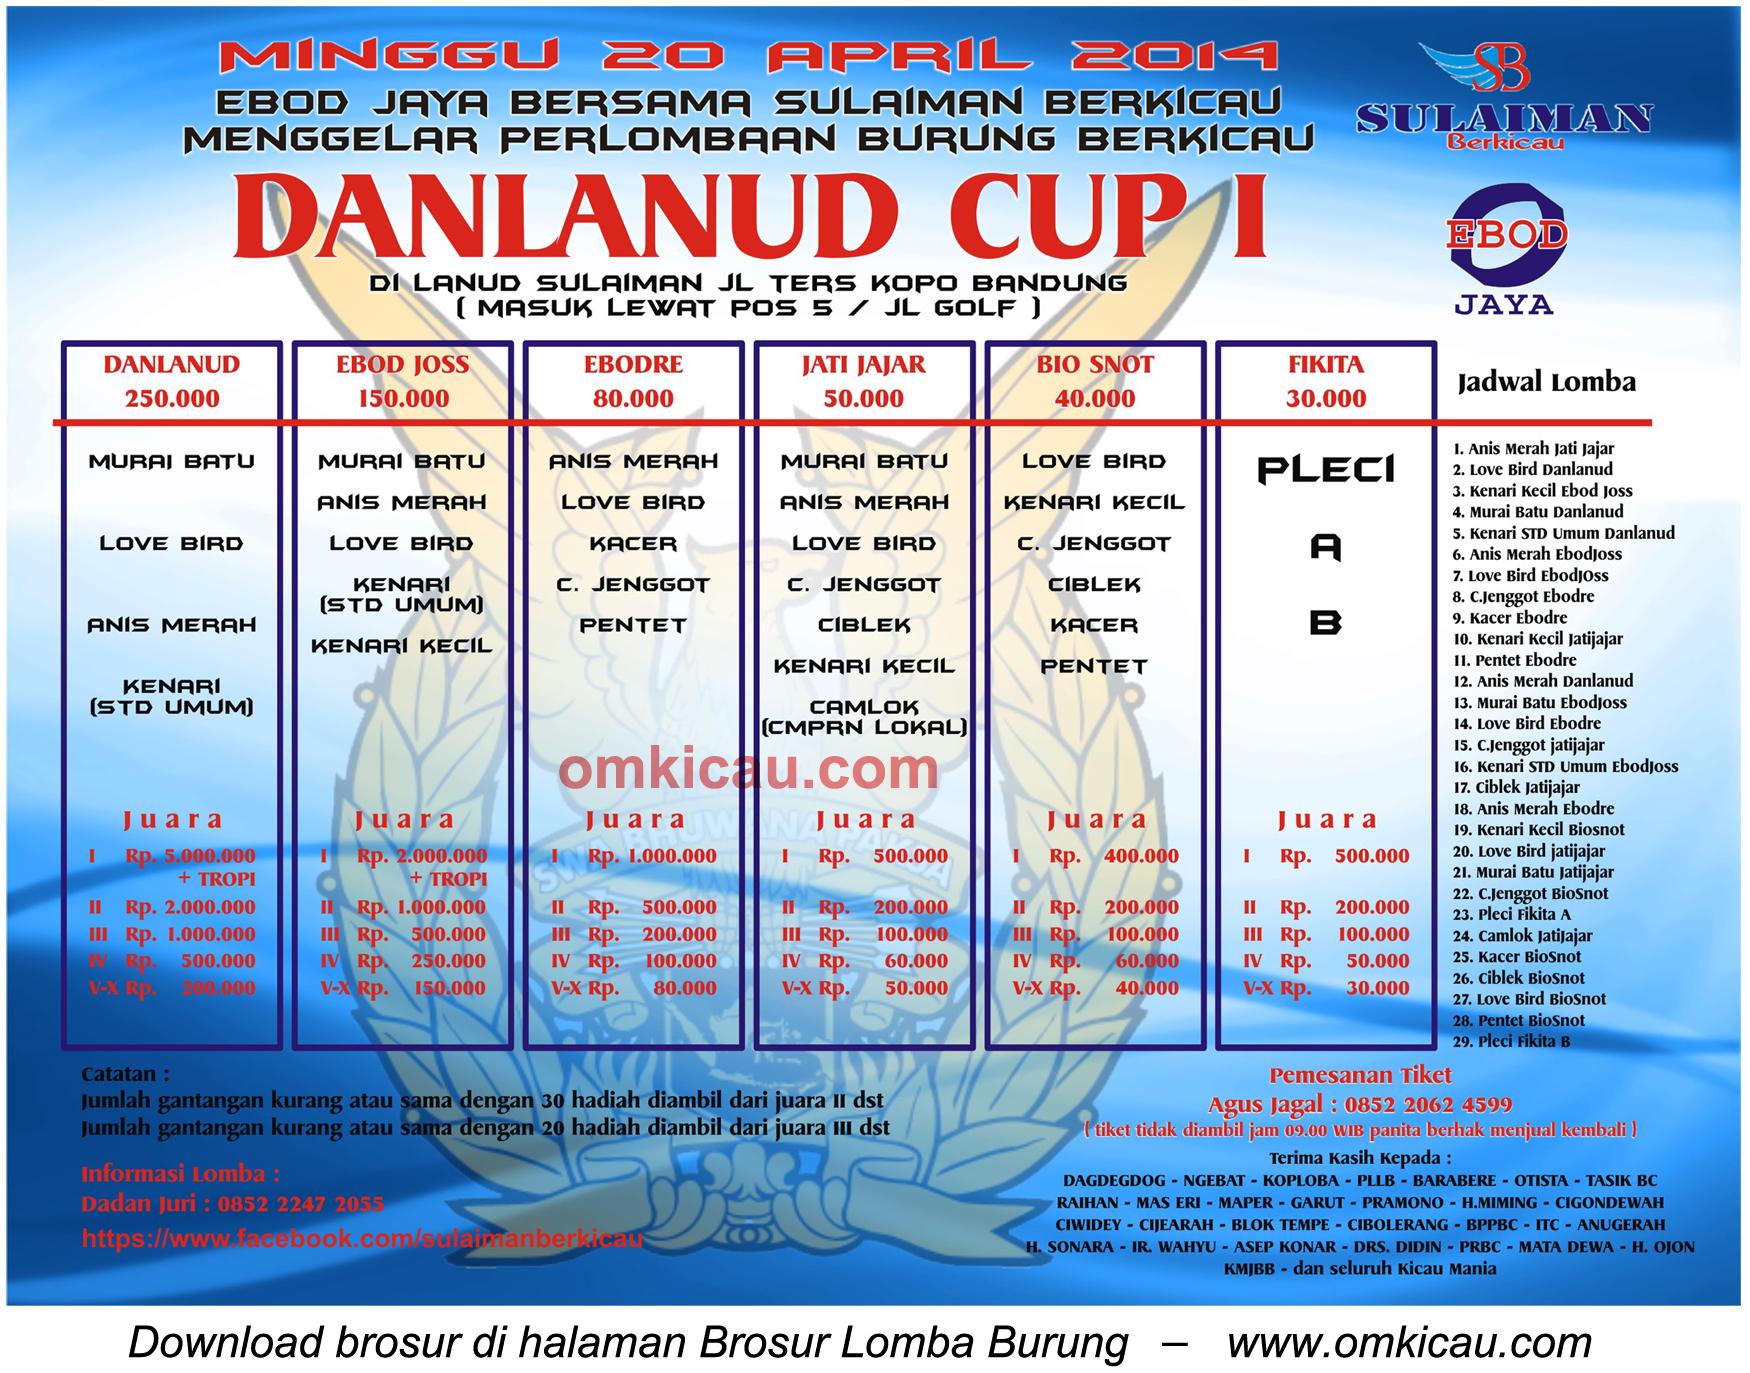 Brosur Lomba Burung Berkicau Danlanud Cup I, Bandung, 20 April 2014